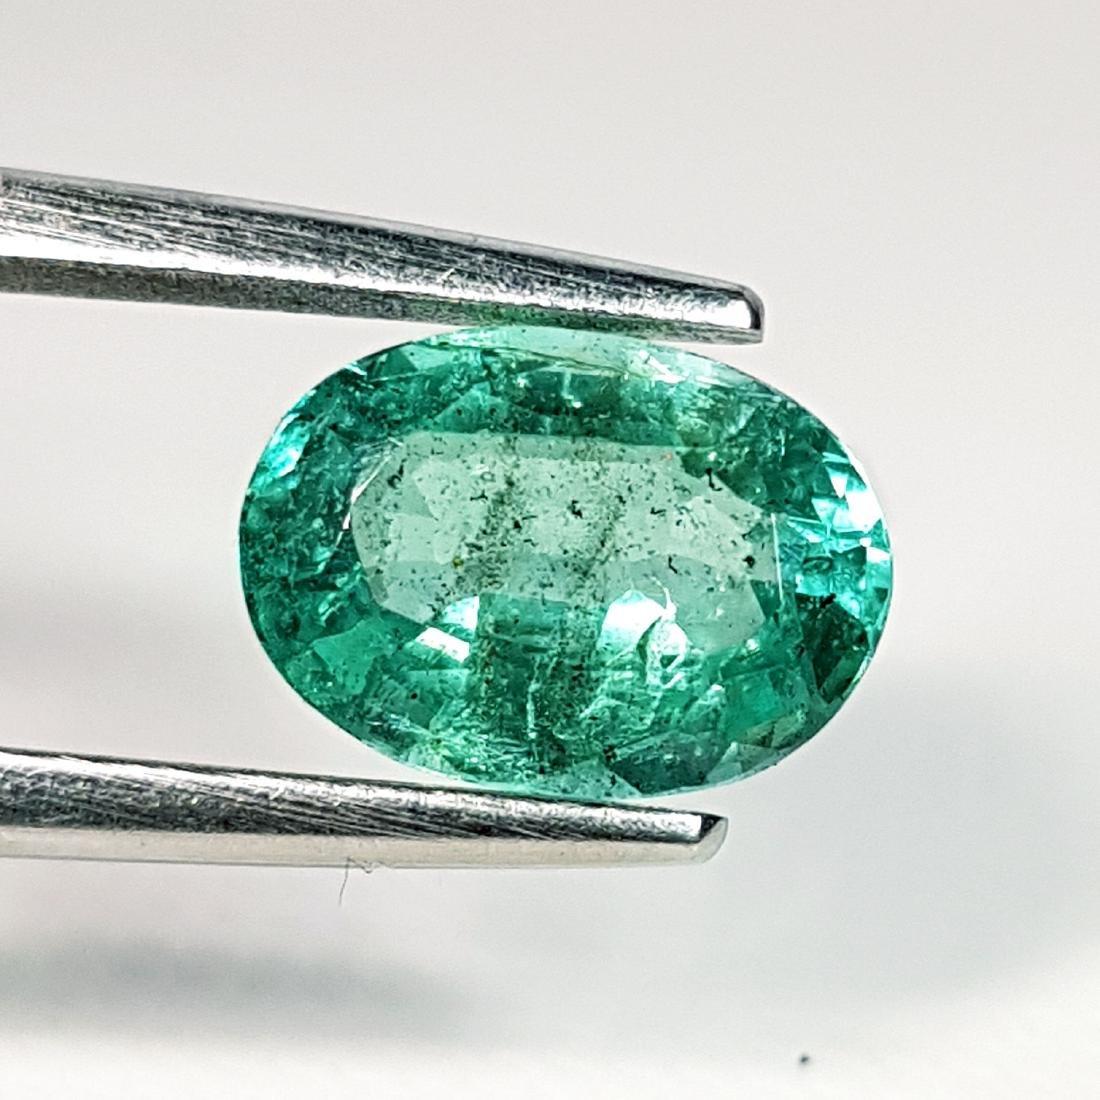 Wonderful Oval Cut Natural Emerald - 1.90 ct